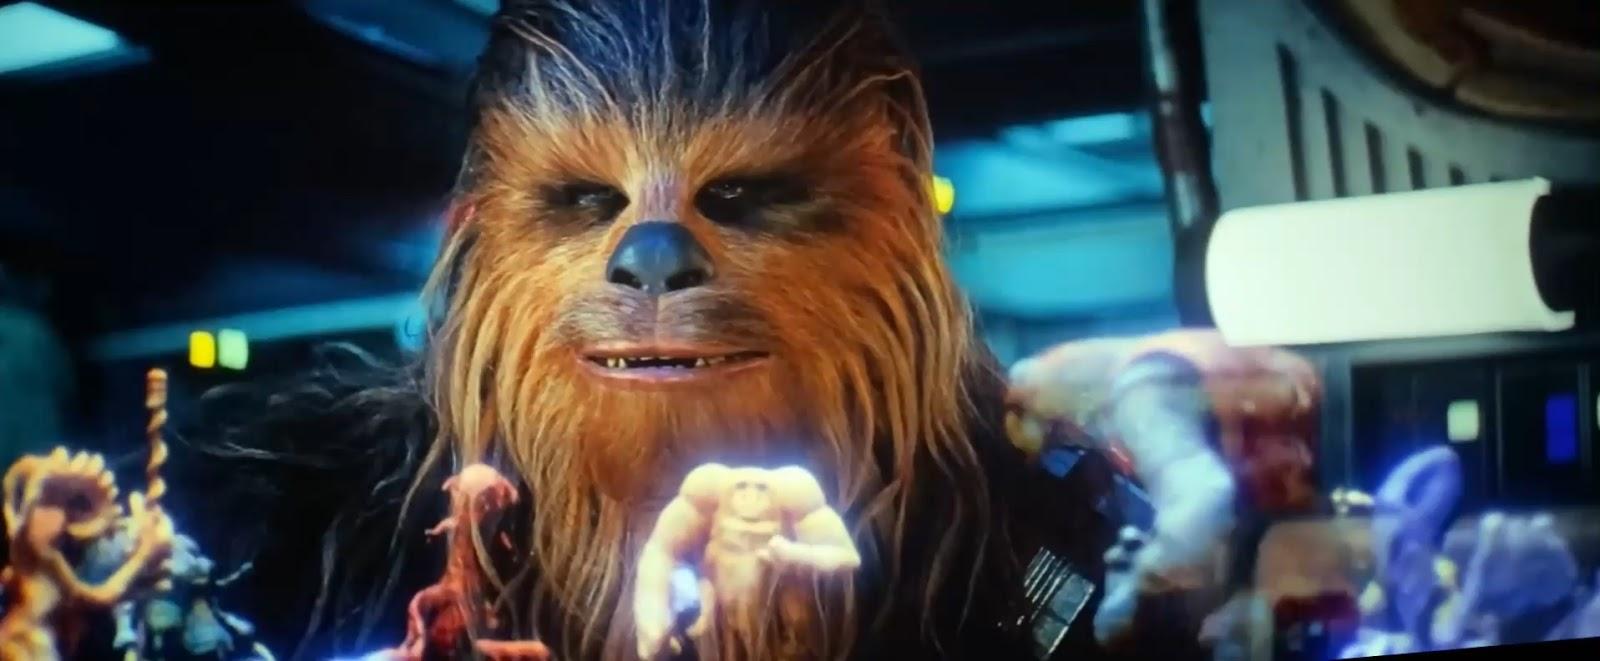 Star+Wars+El+ascenso+de+Skywalker+%282019%29+HDTS+1080p+Latino+-+Ingles.mkv_snapshot_00.06.52.833.jpg (1600×661)